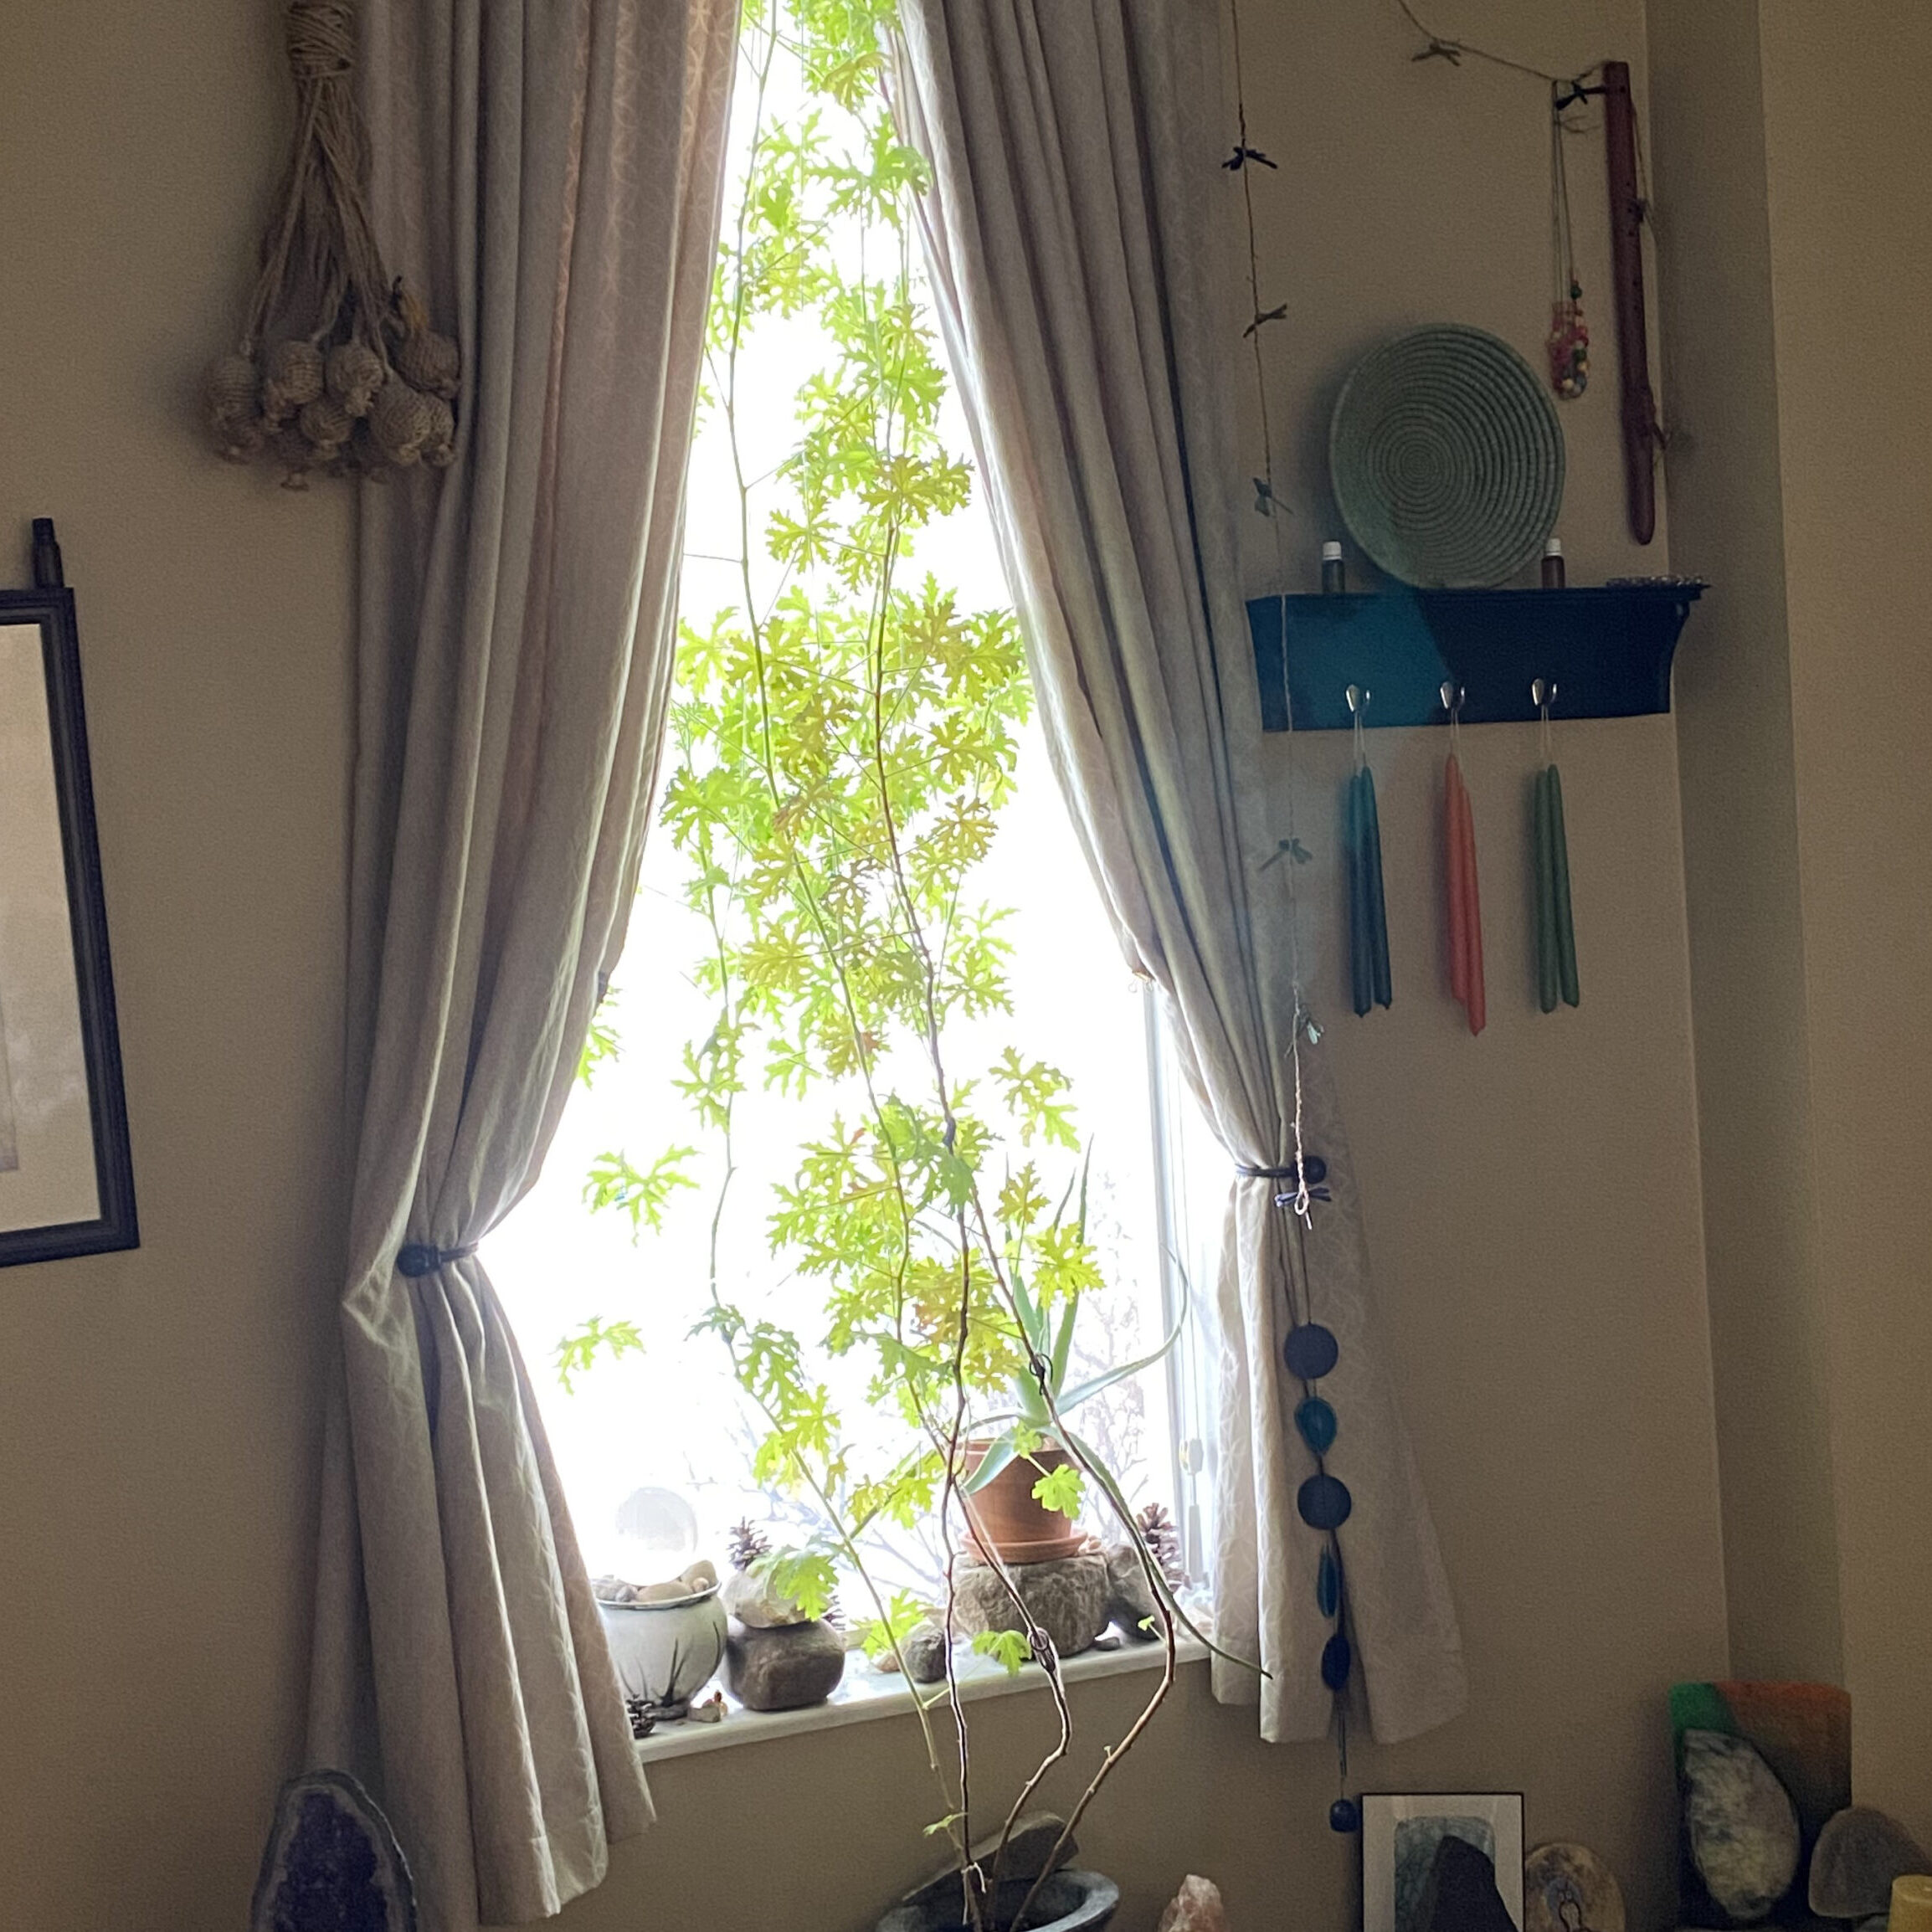 window-performatyourbest